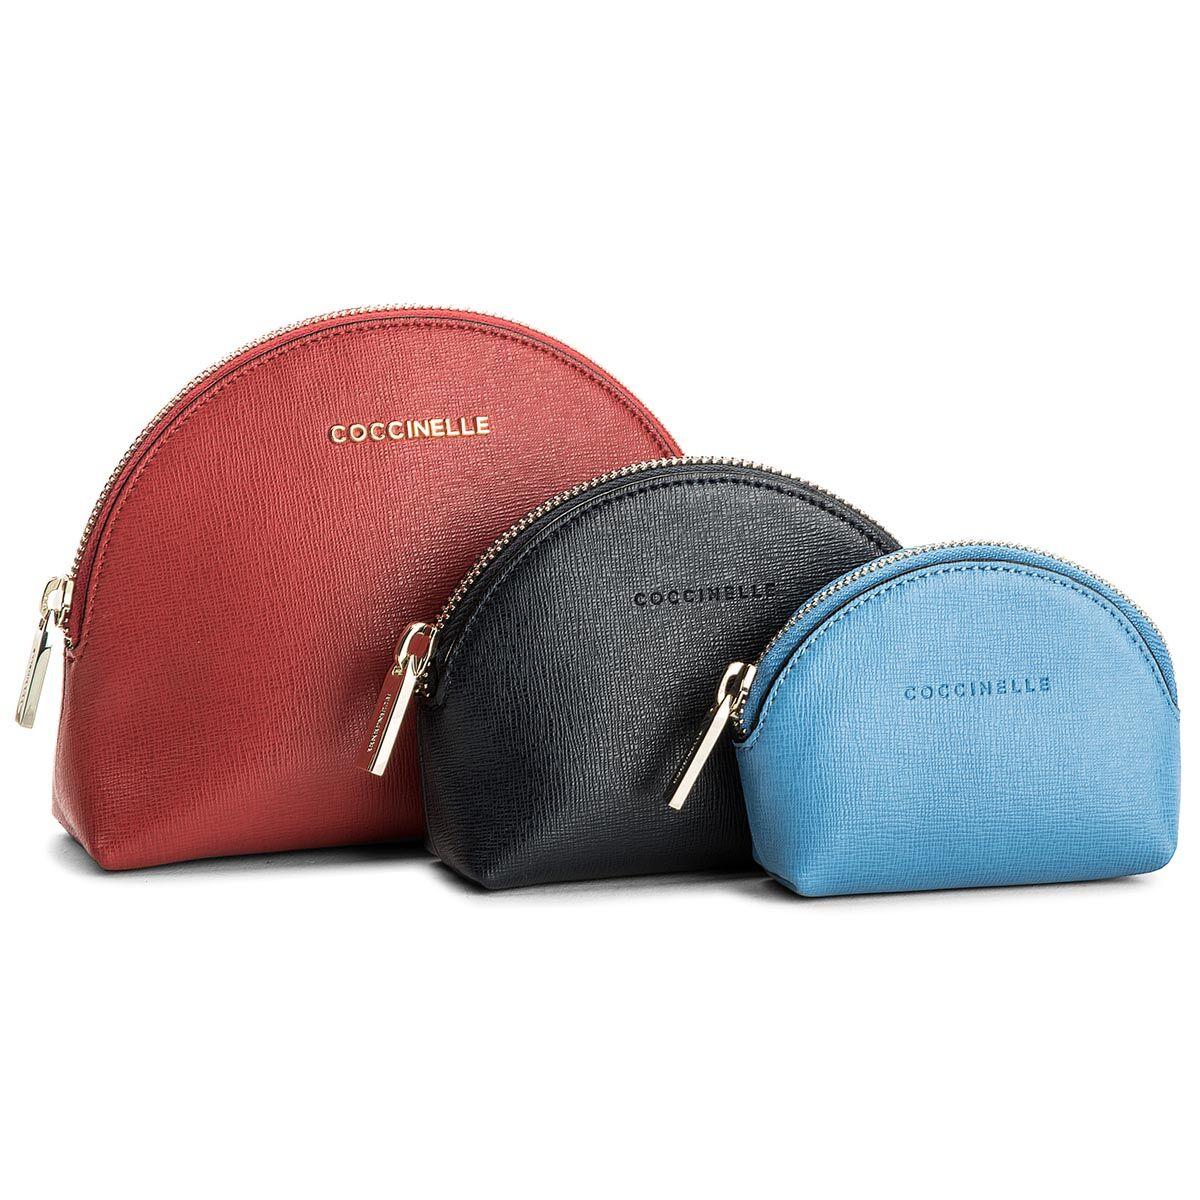 Zestaw kosmetyczek COCCINELLE - BV0 Trousse E5 25 B0 05 Coque/Bleu/Azur 493